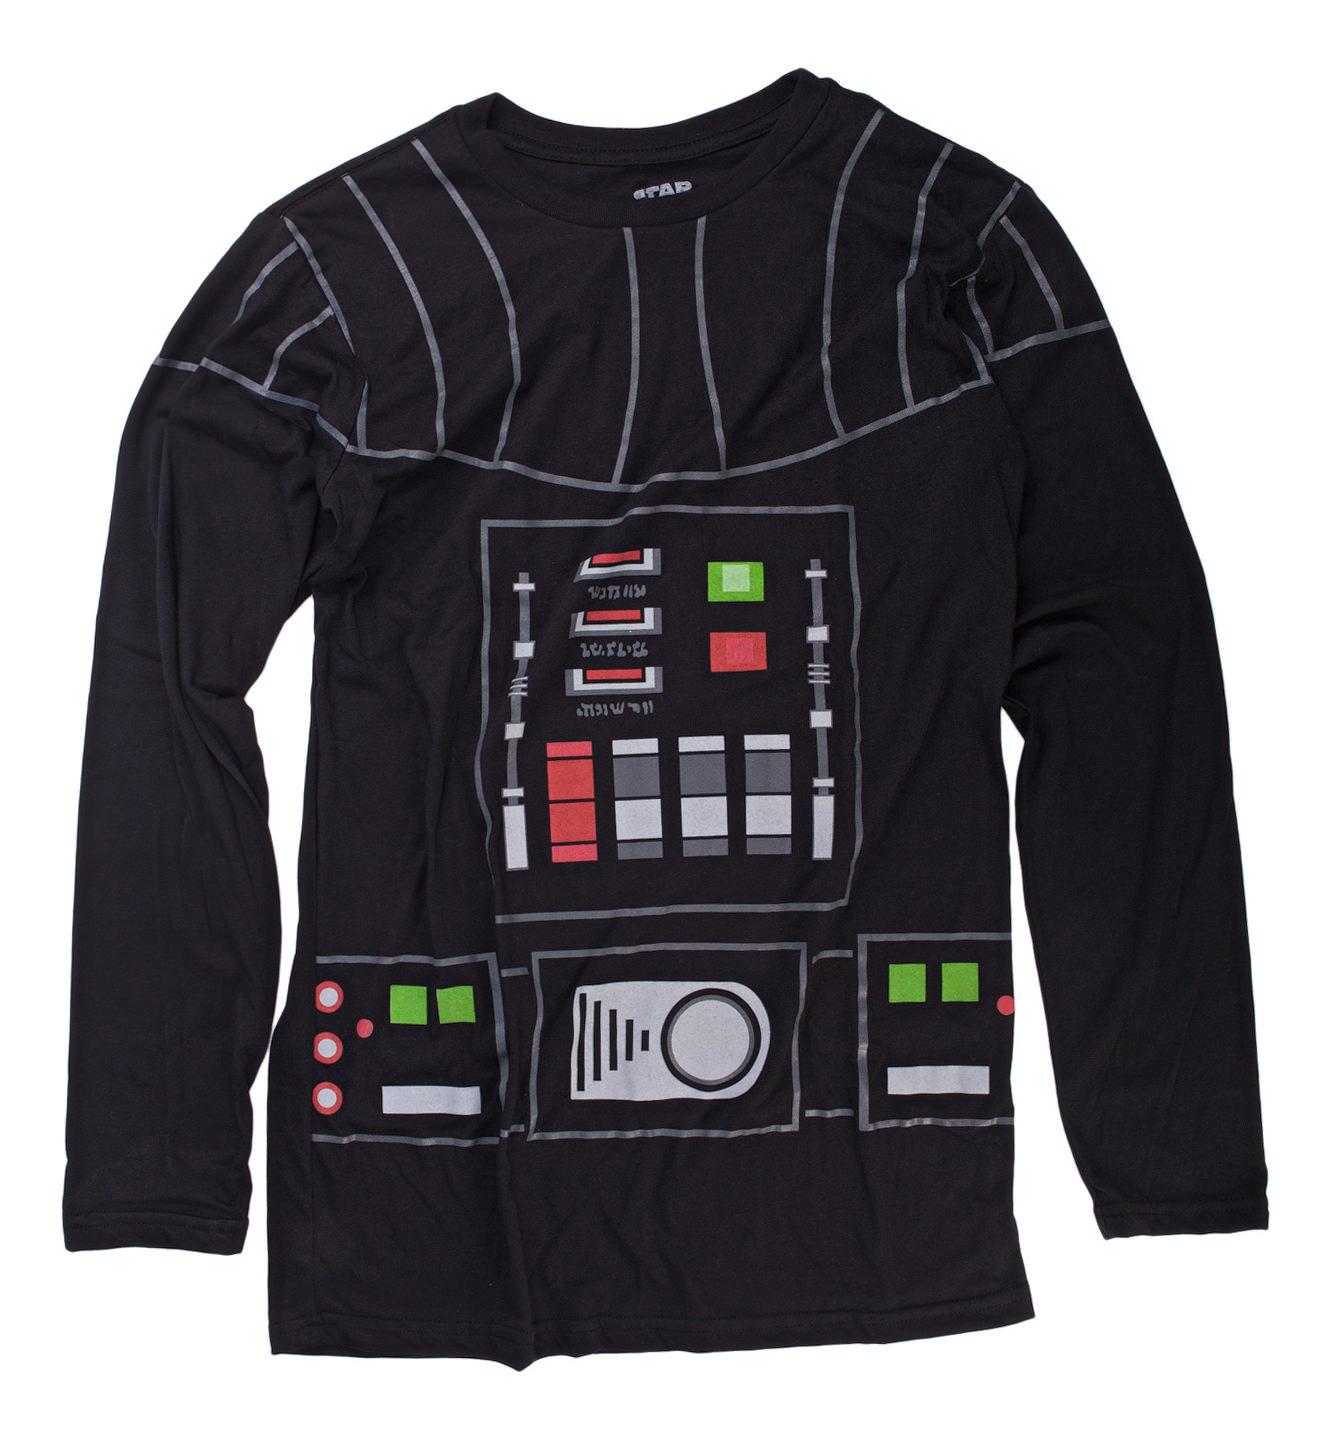 Star Wars I Am Darth Vader Lightweight Long Sleeve Costume T-Shirt | M